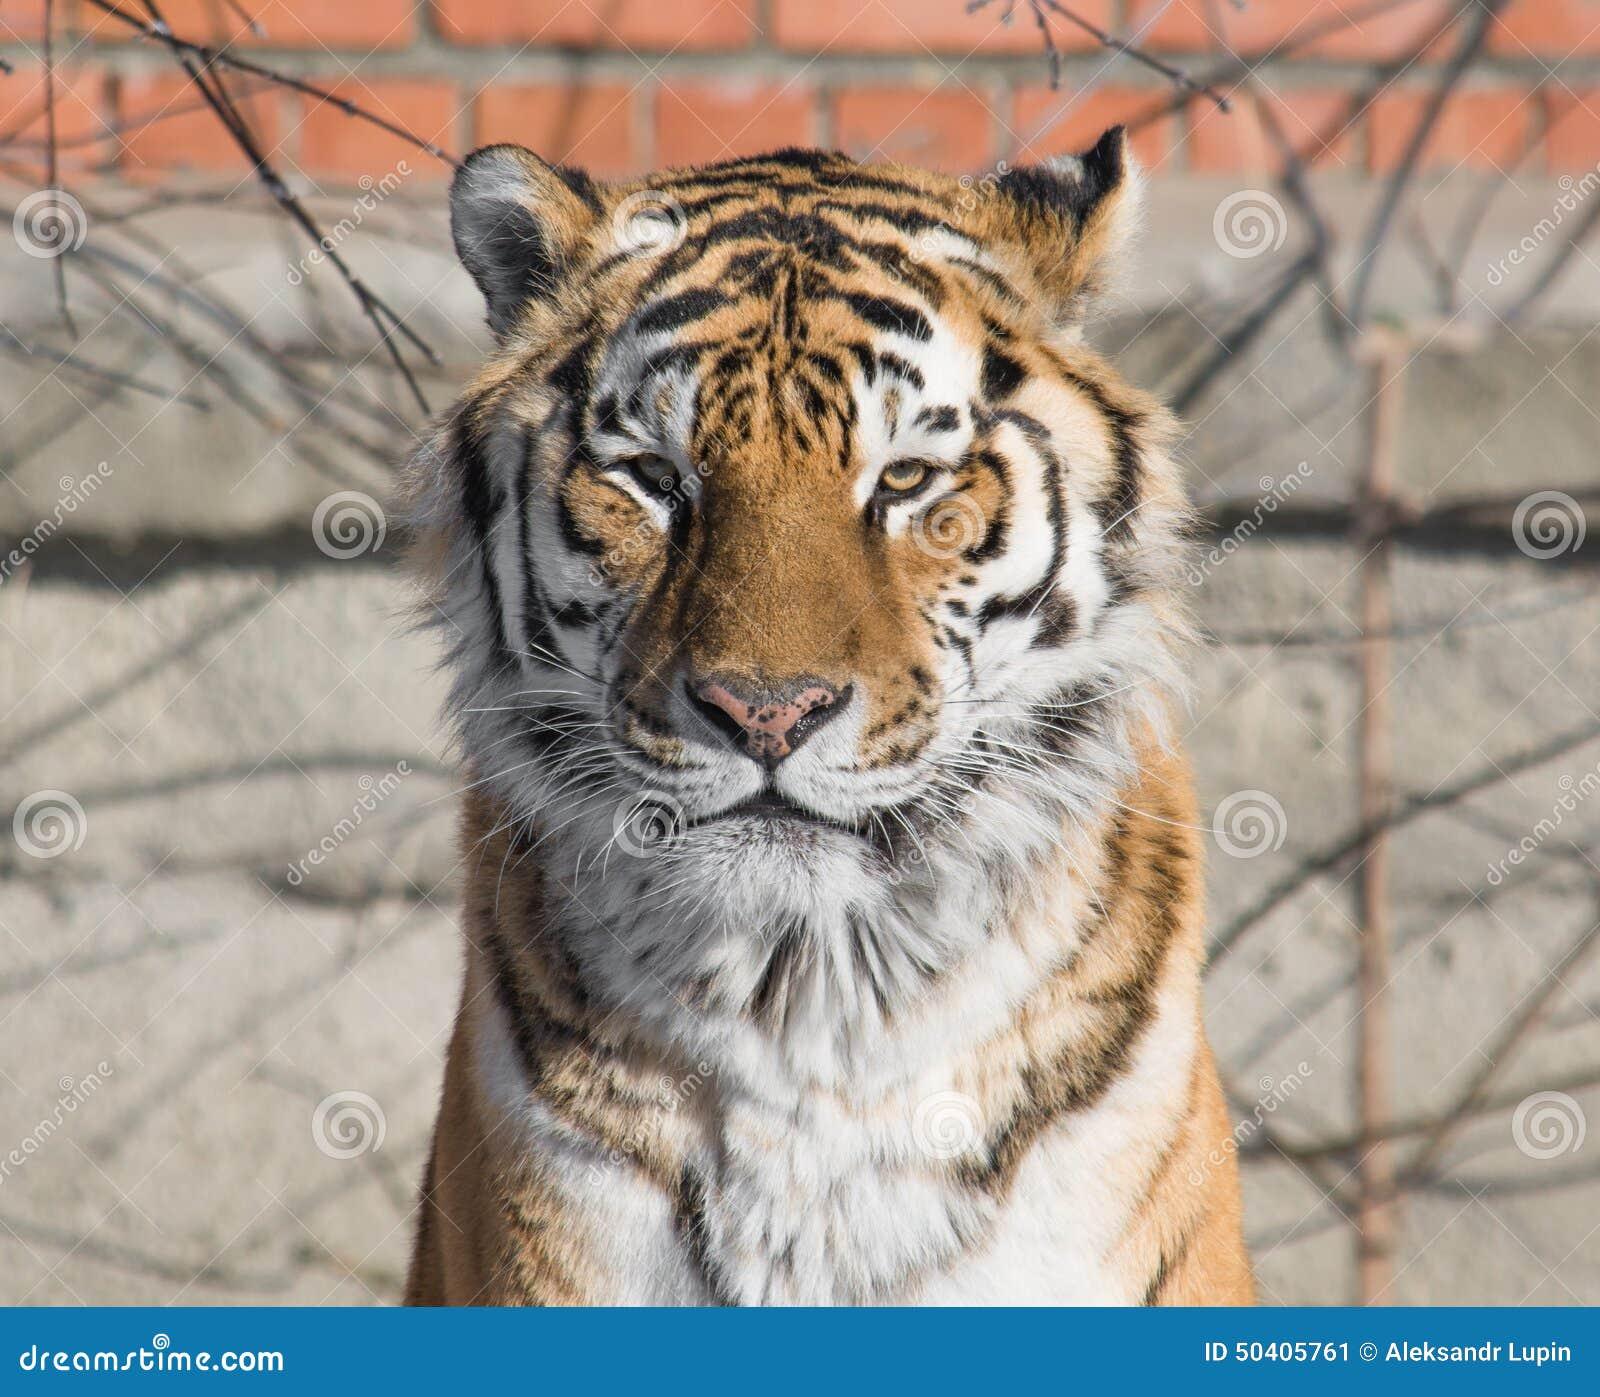 Tiger Look Stock Photo